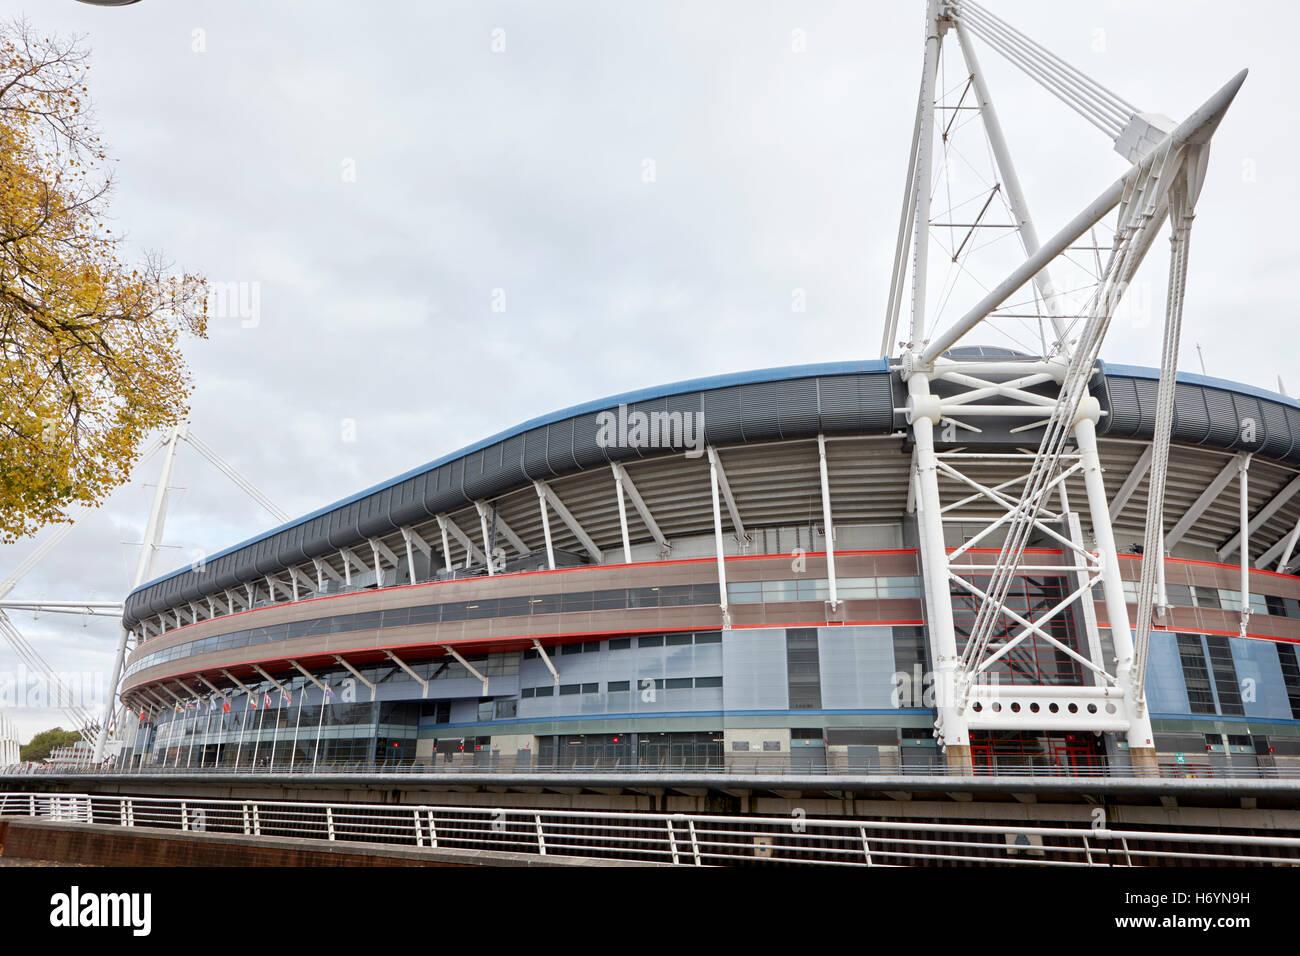 principality stadium formerly millennium stadium Cardiff Wales United Kingdom - Stock Image